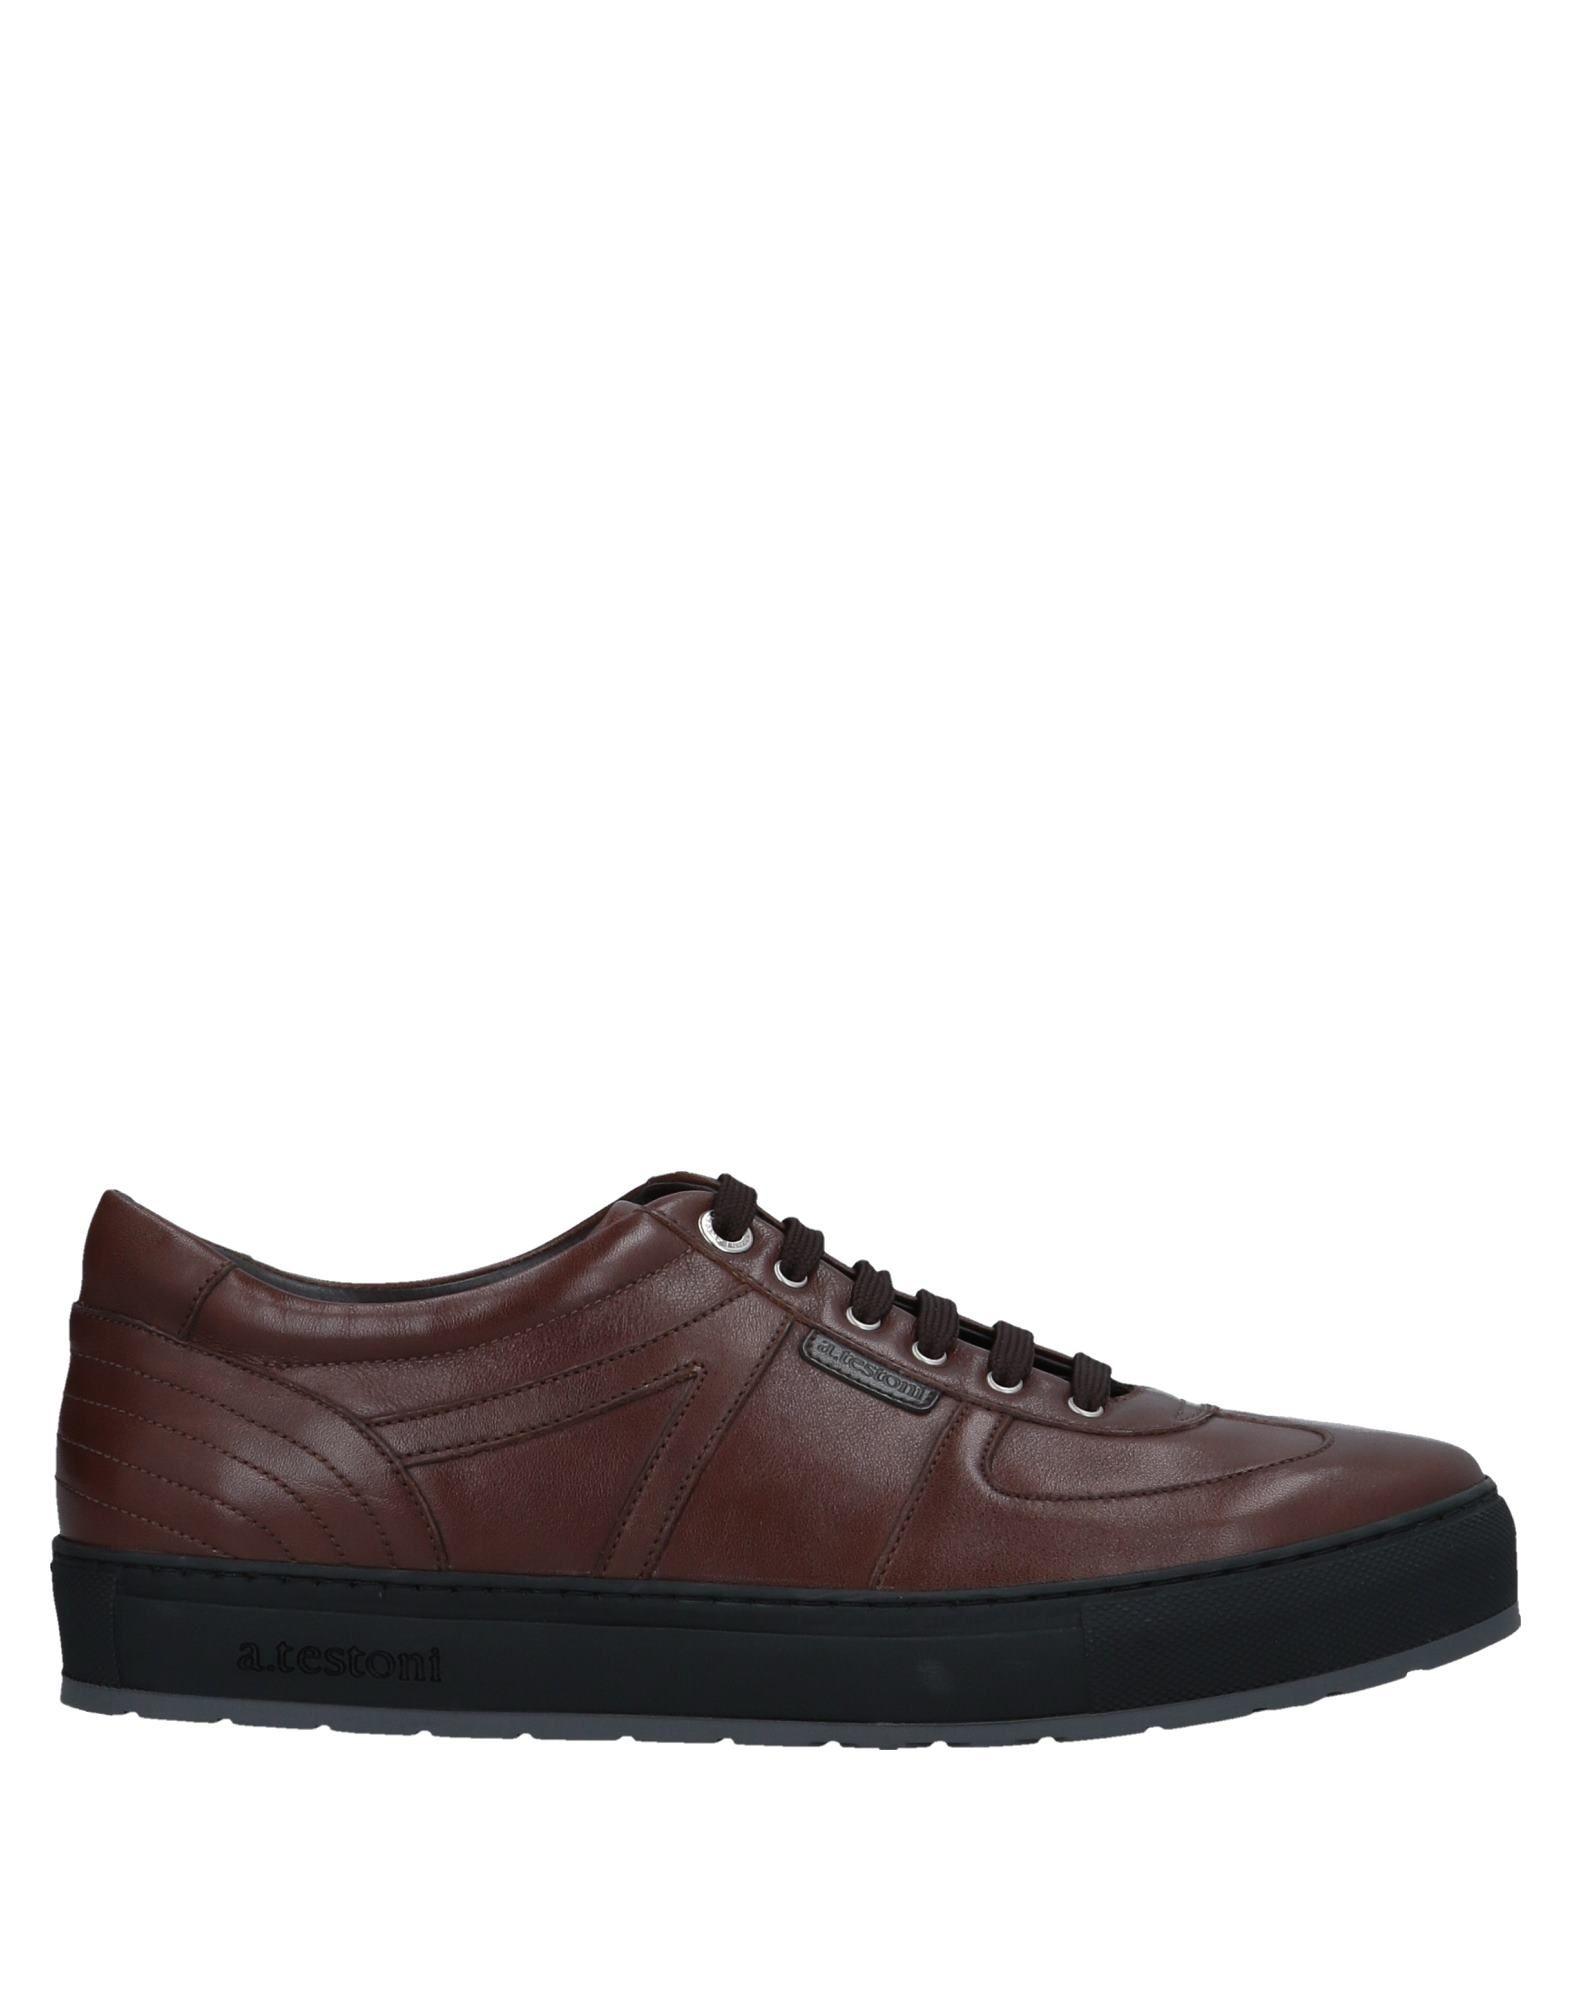 A.Testoni Sneakers Herren  11542488IO Gute Qualität beliebte Schuhe